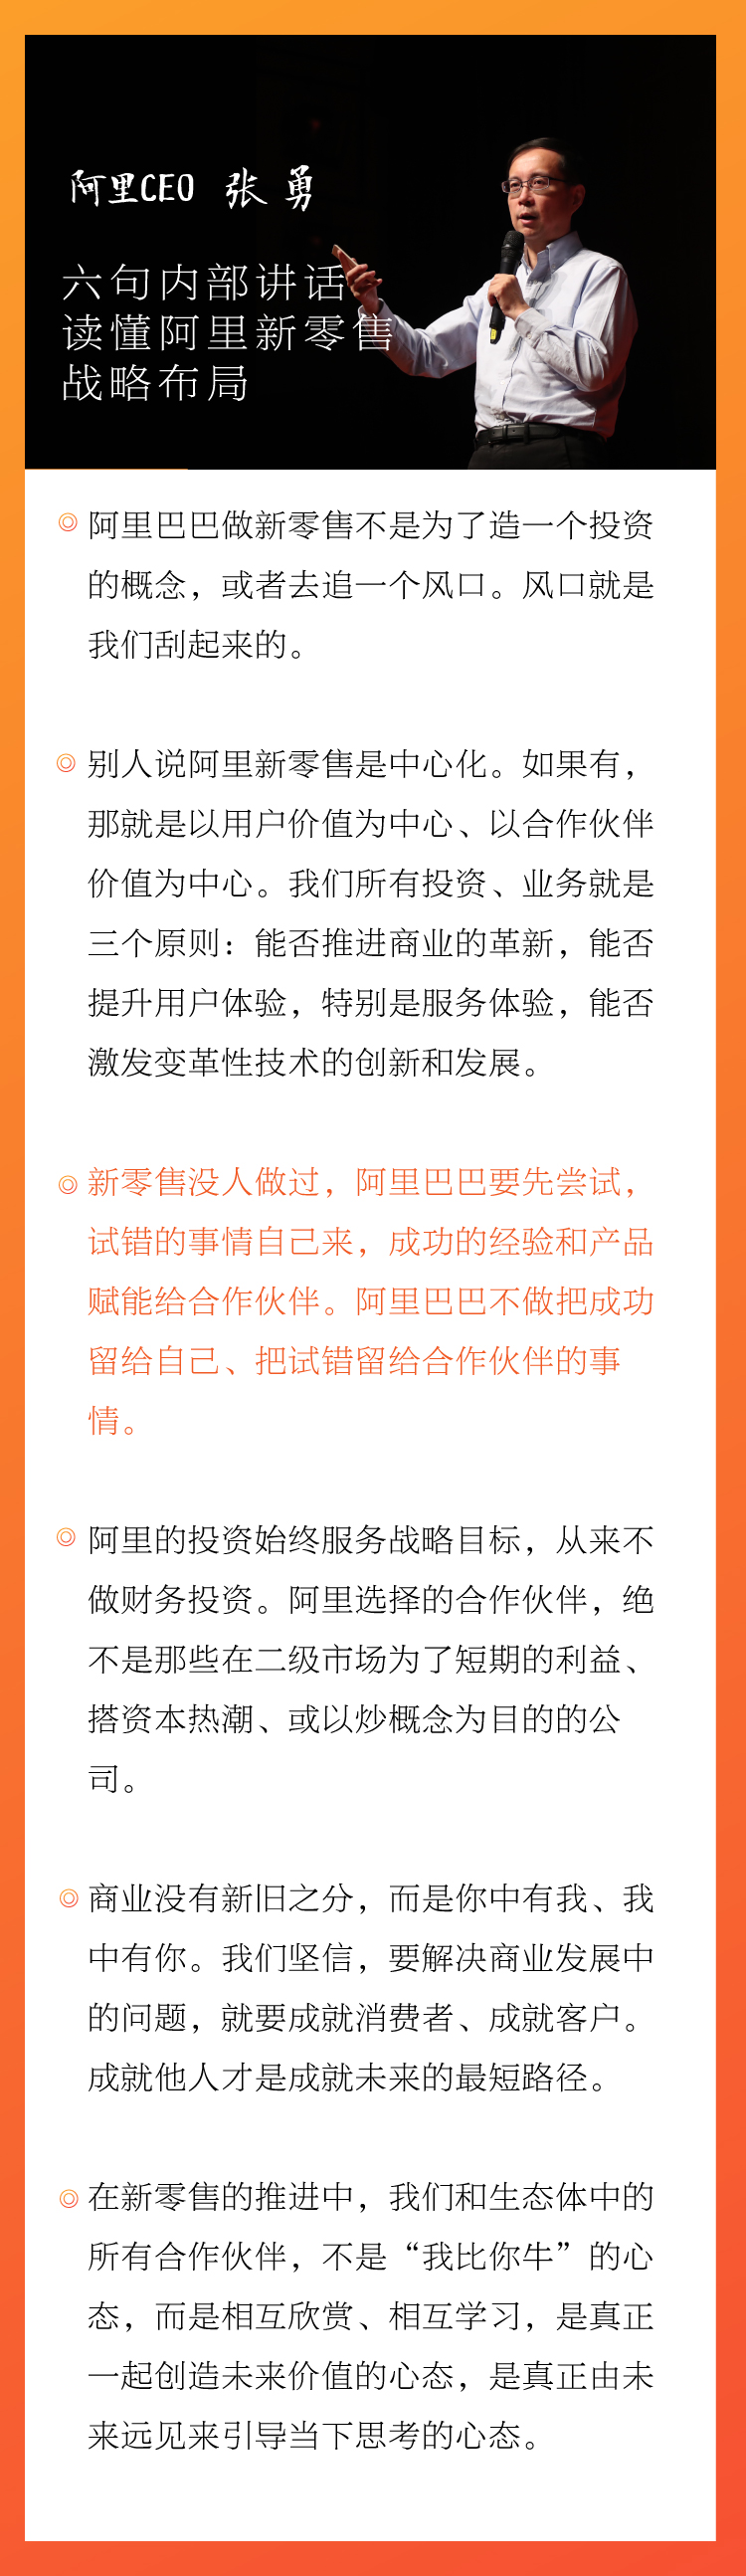 "mg电子游戏网站大全:阿里CEO张勇新零售内部讲话:""试错自己来,经验给伙伴"""